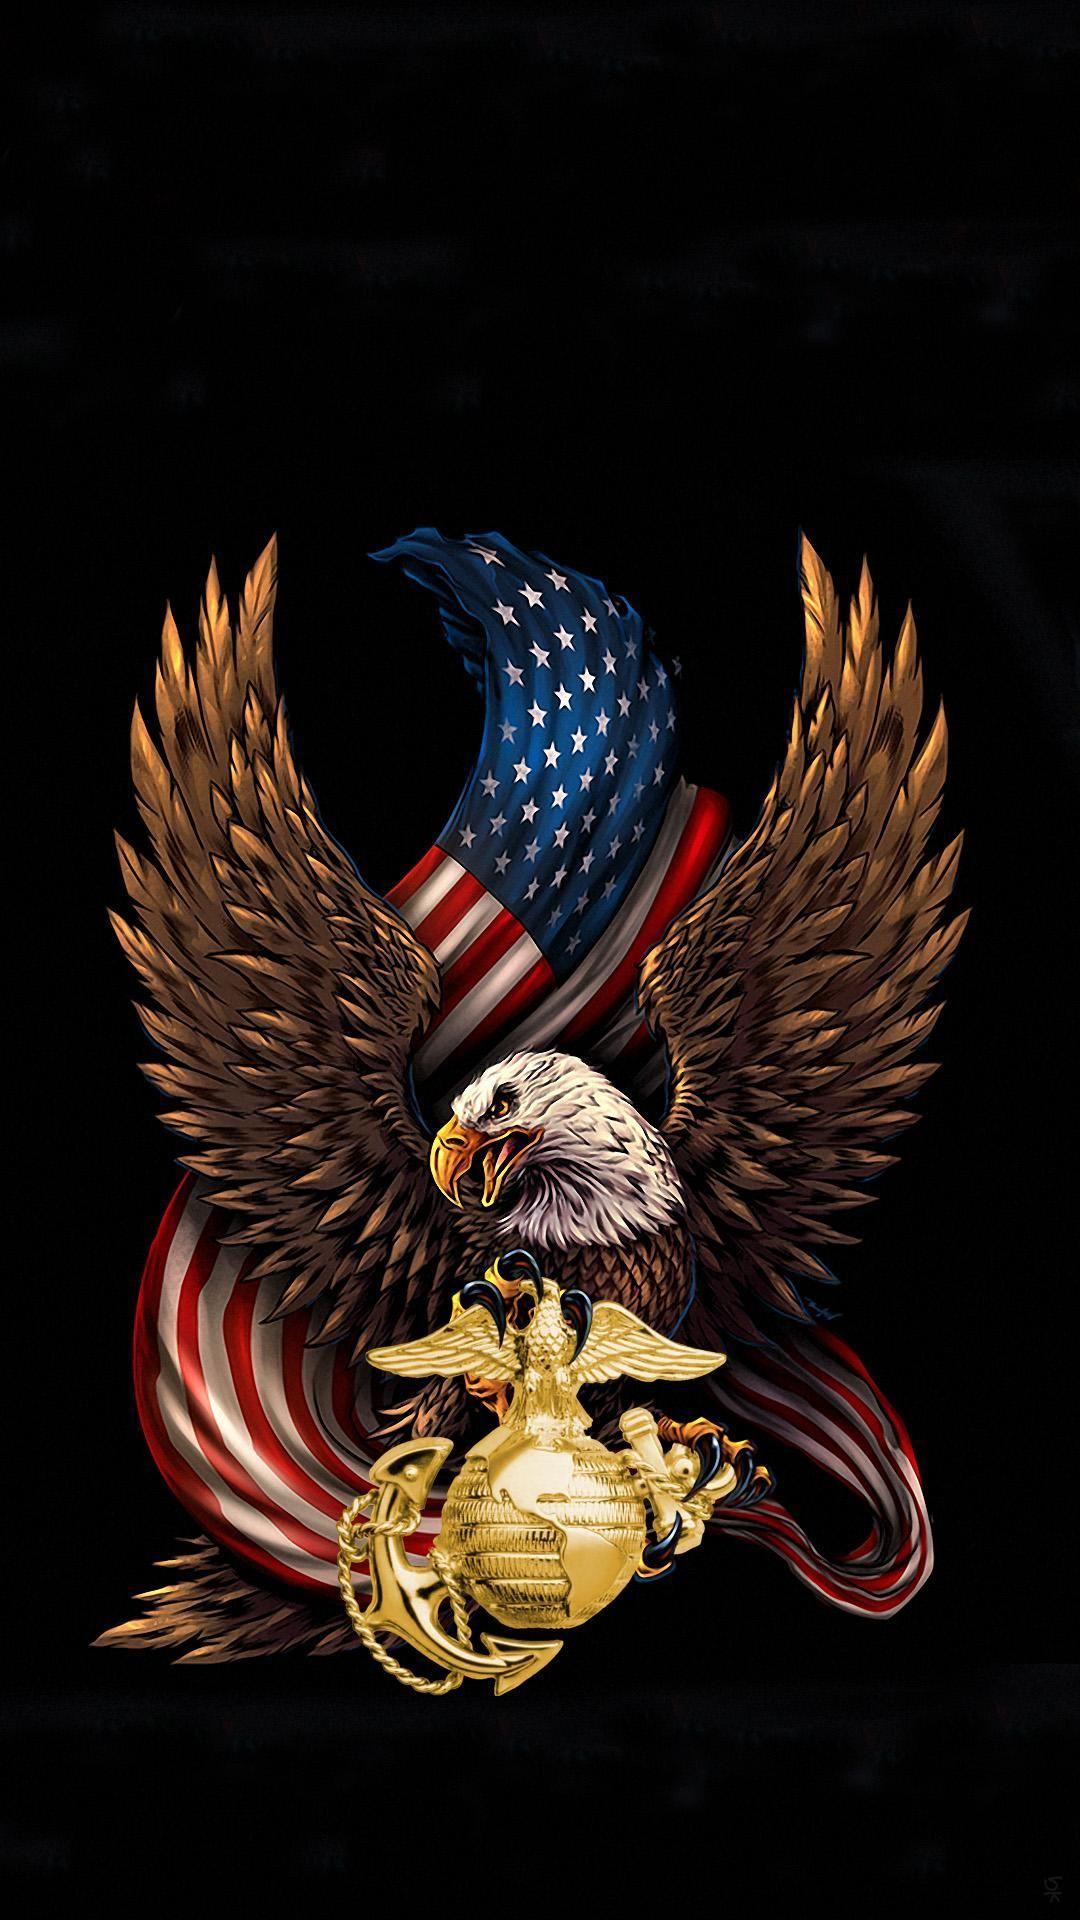 Eagle Iphone Wallpaper Eagle Wallpaper Usmc Wallpaper Navy Seal Wallpaper